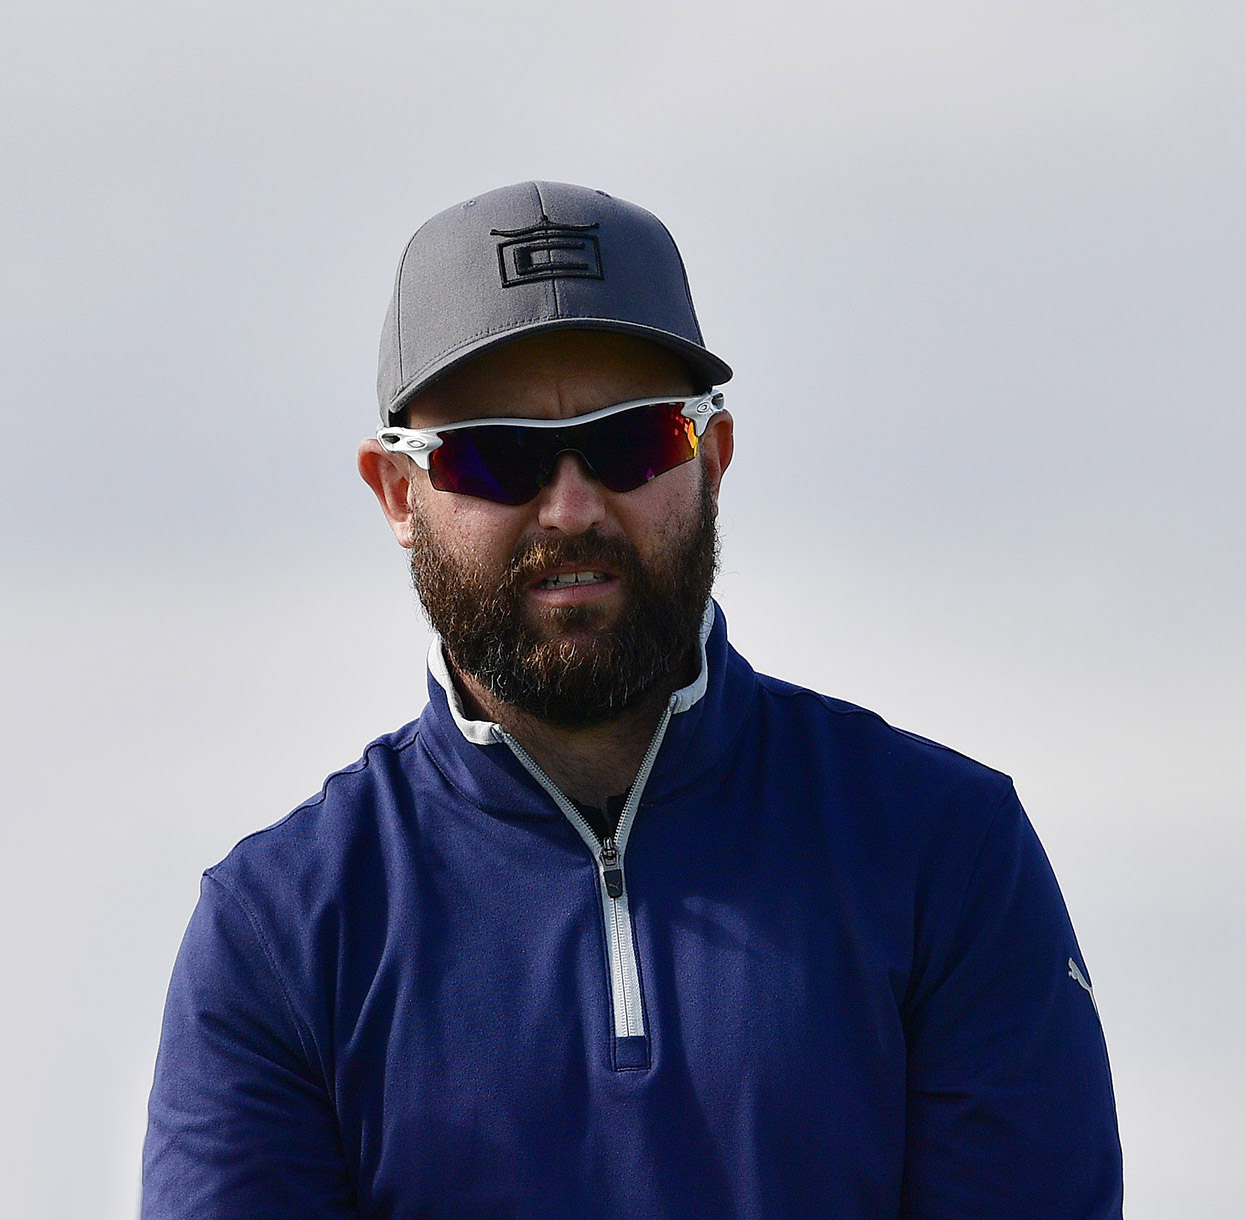 Stephen Ferreira alcança 14.º lugar no Cape Town Open